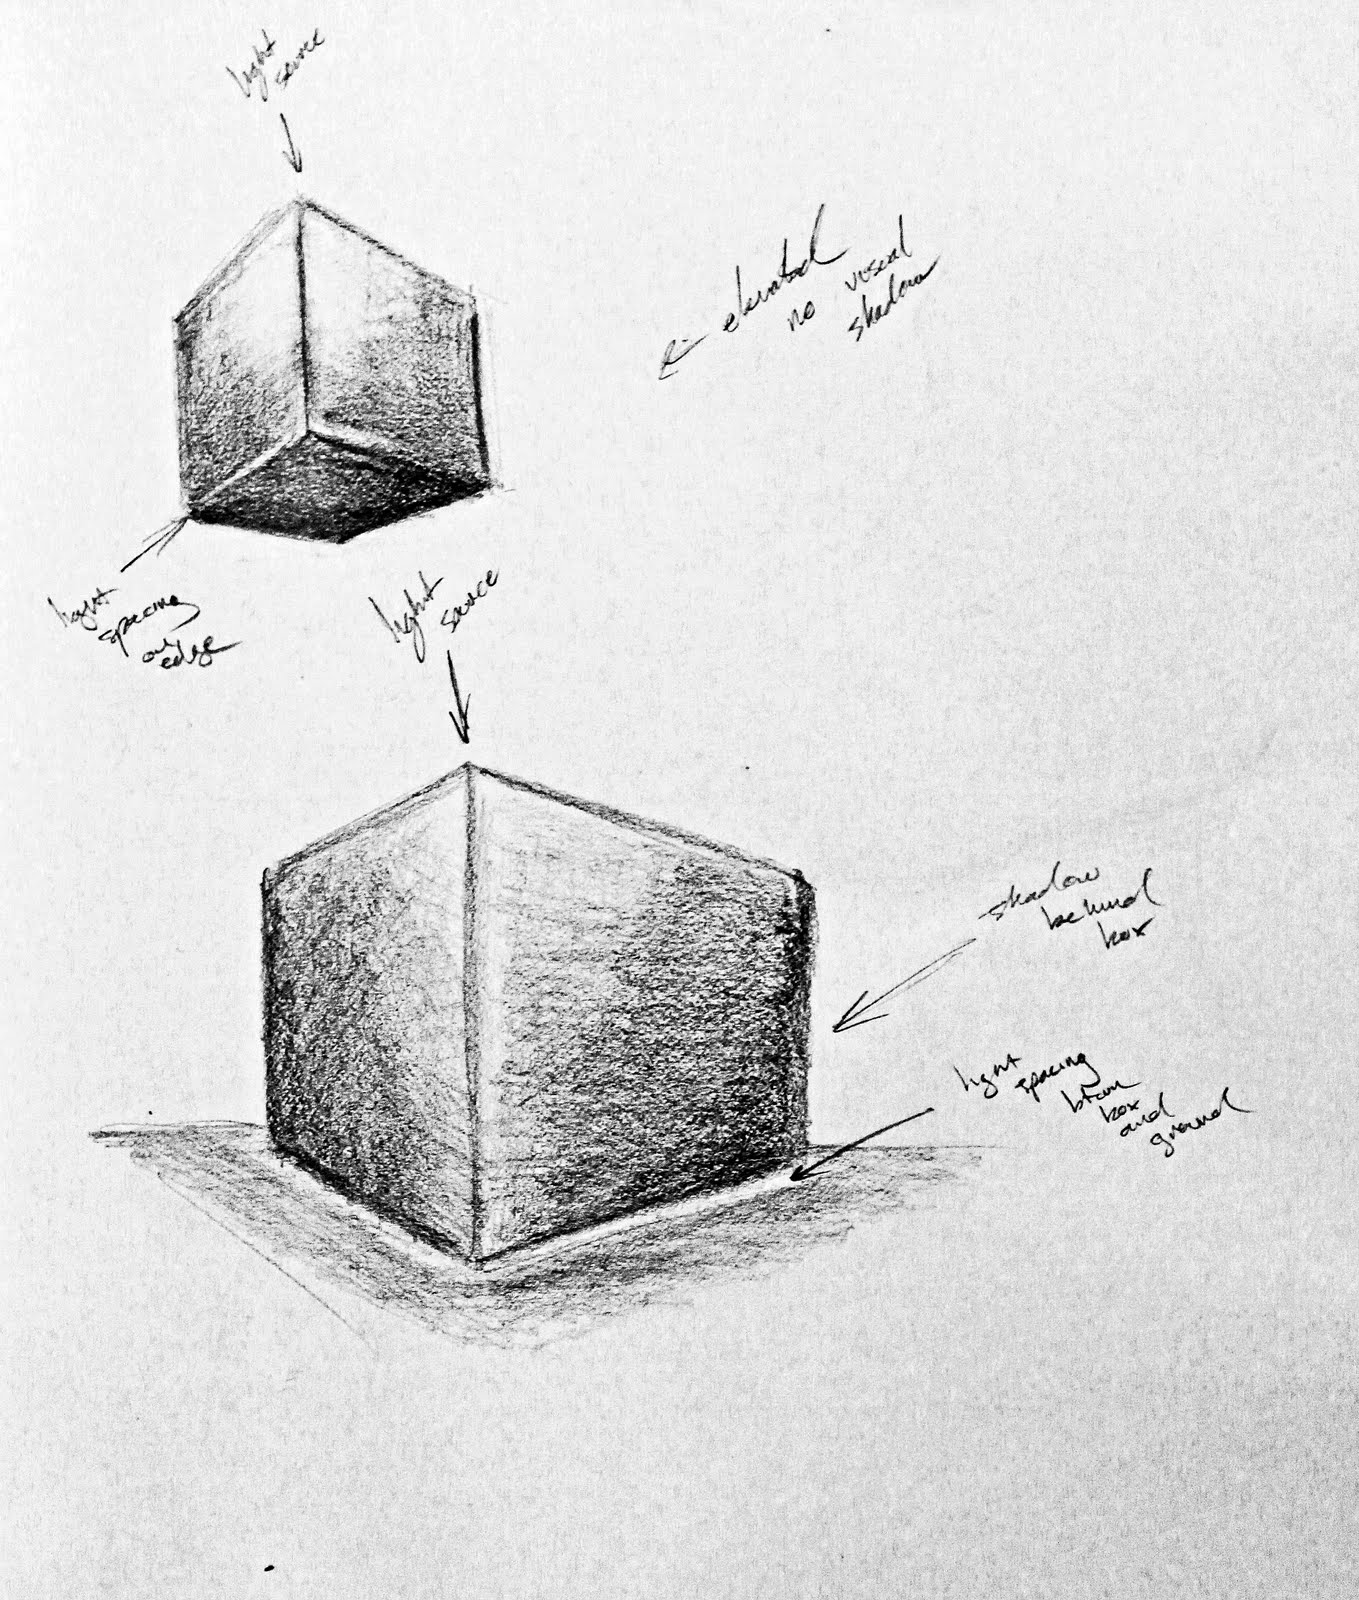 Shape shading sketches